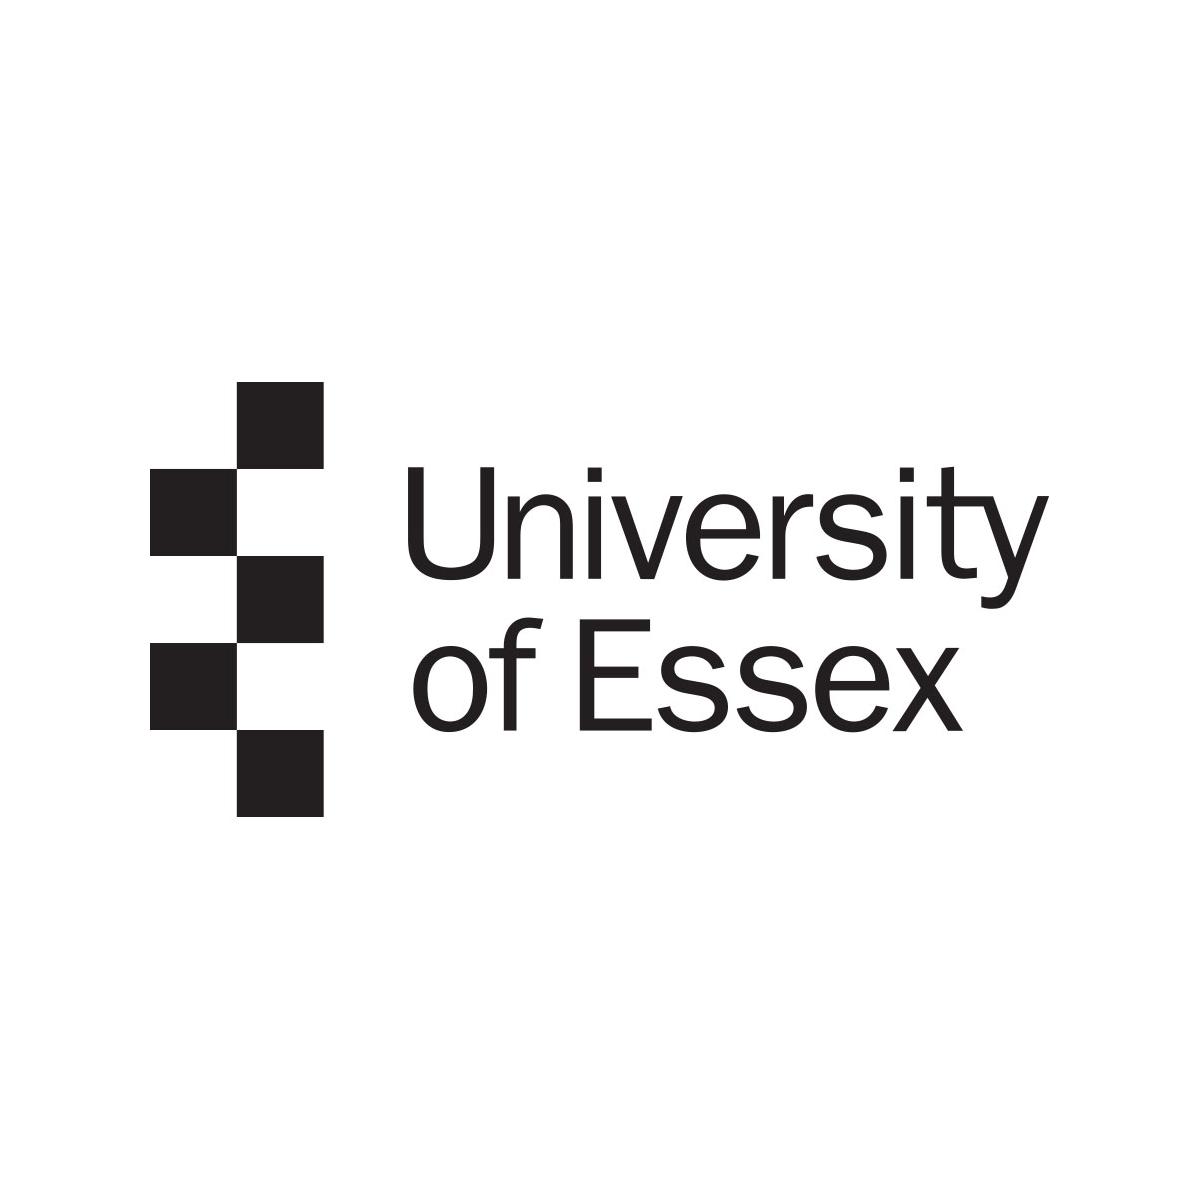 Logo of University of Essex